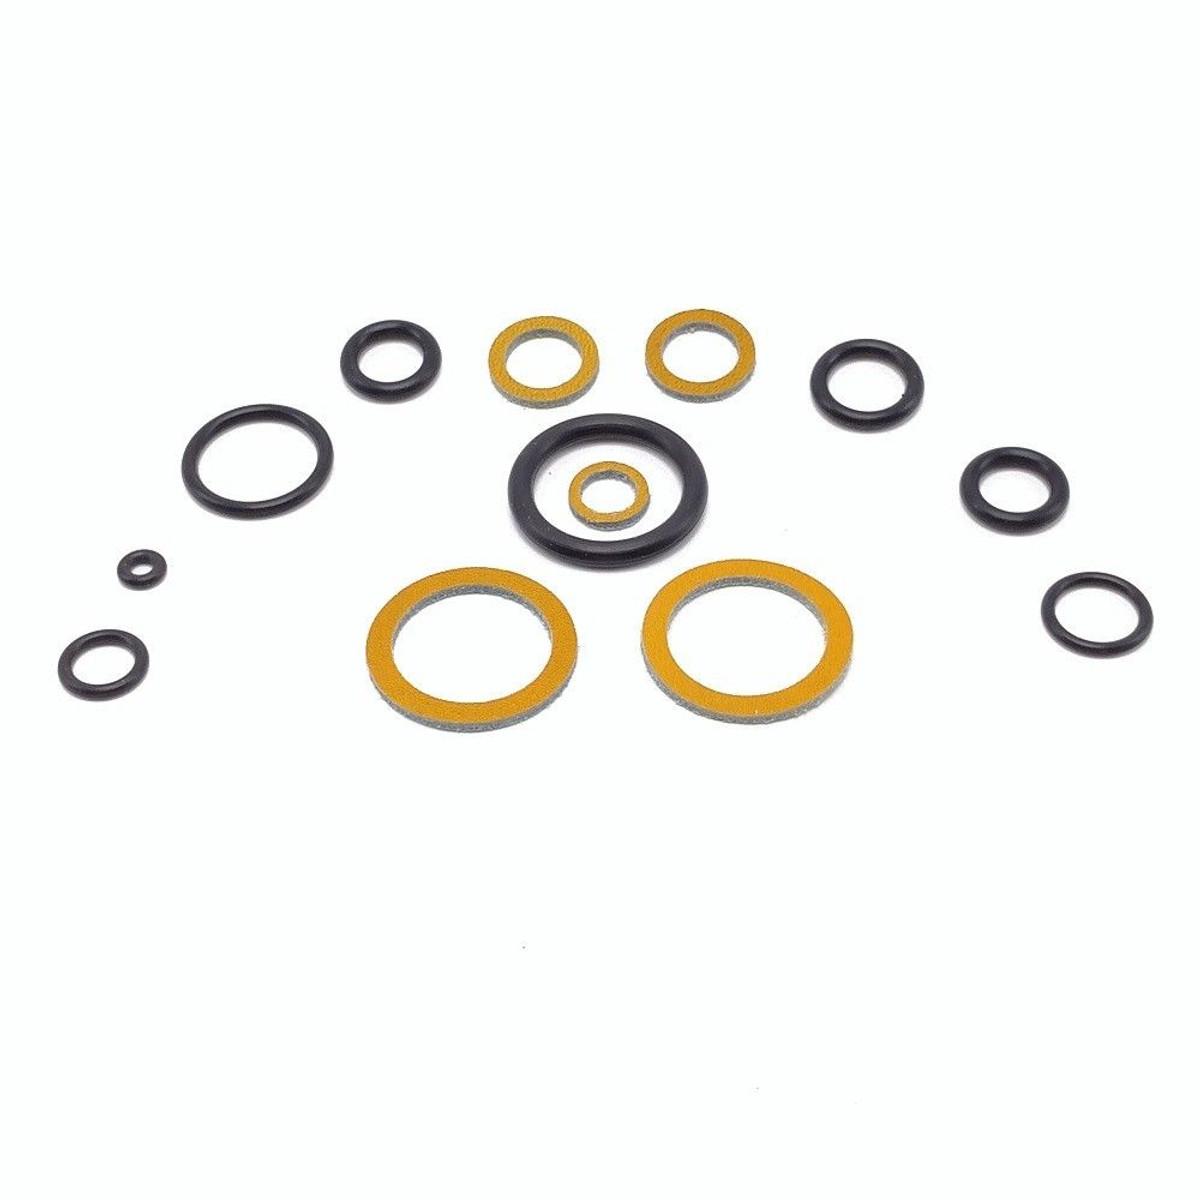 HE625/HE1506 Mooney M20 Series Hydraulic flap actuator 65-67 M20C, M20D, M20E, M20F